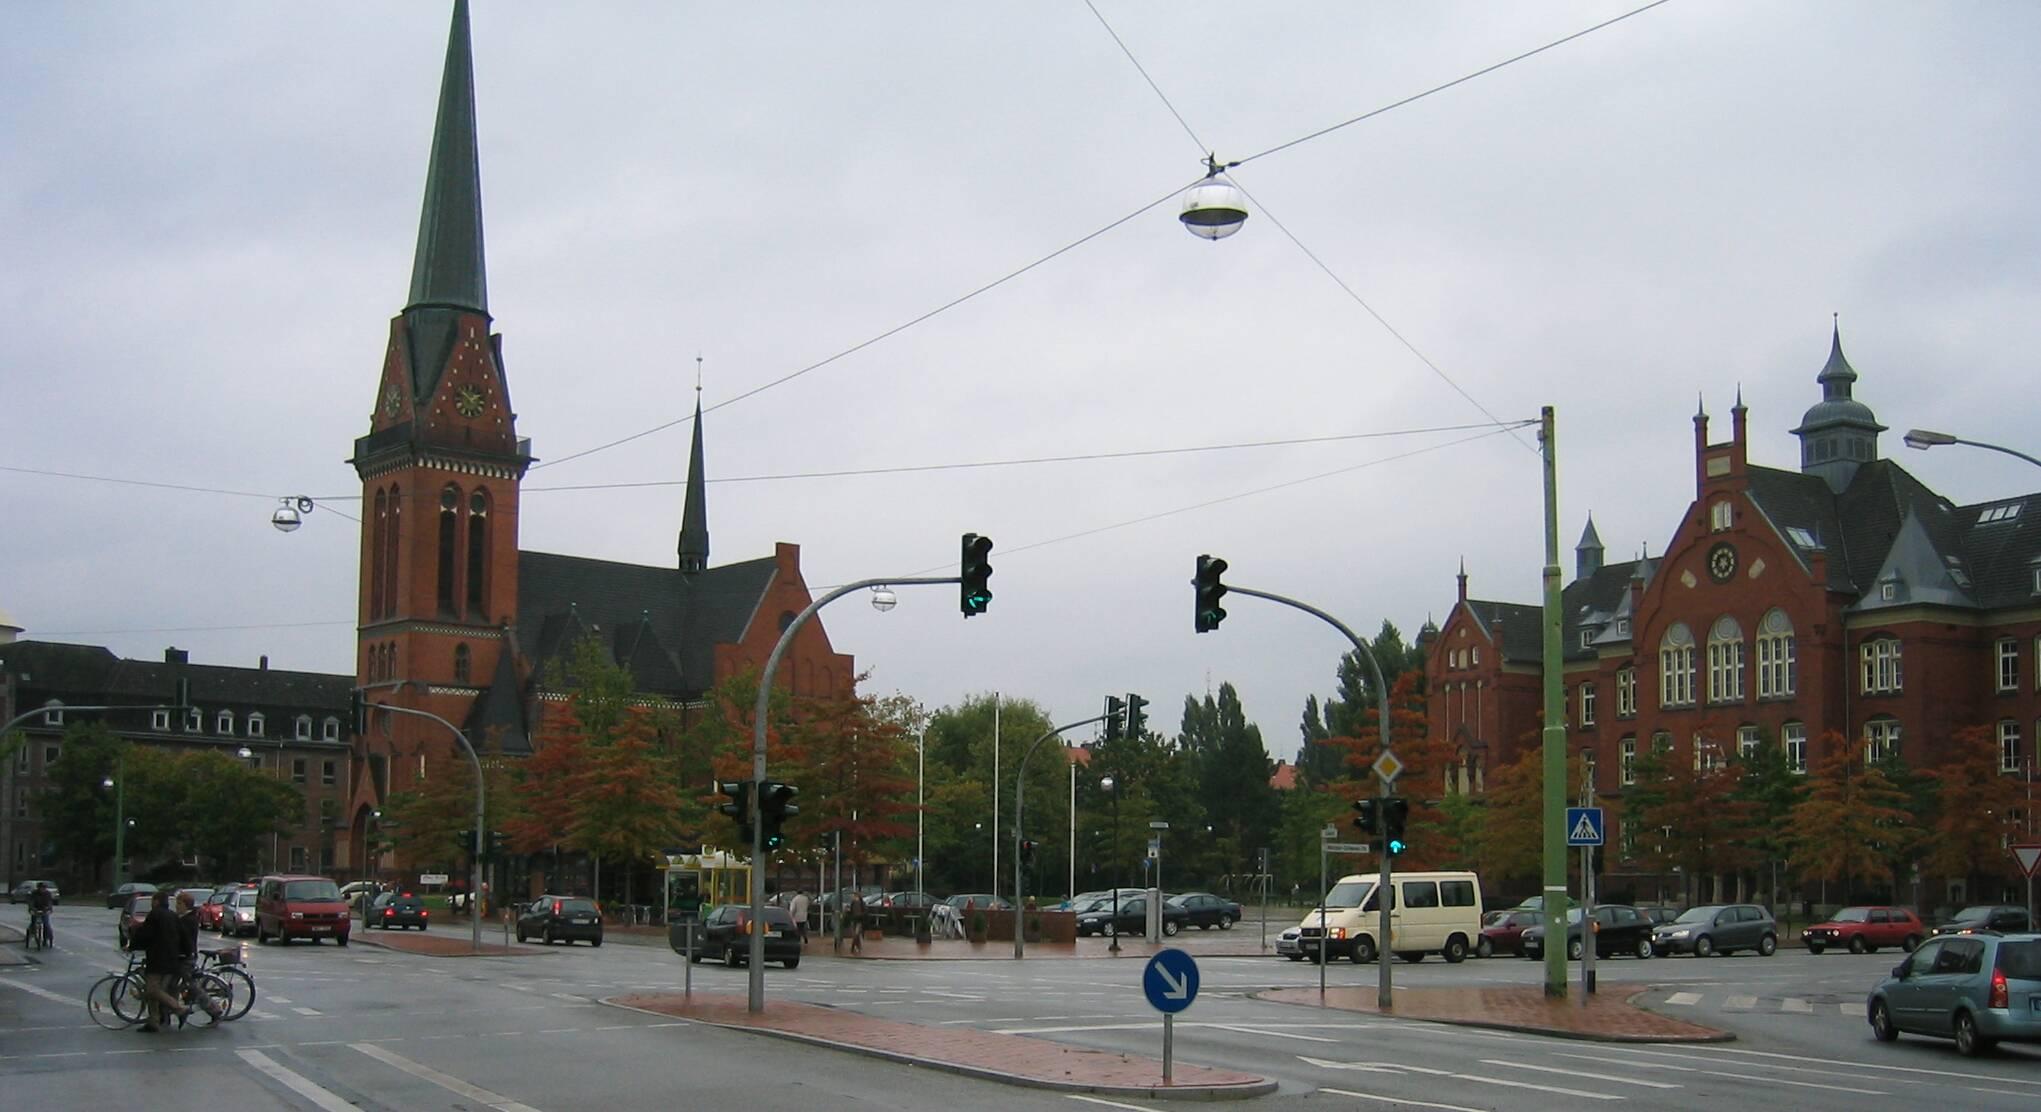 Bremerhaven-Lehe